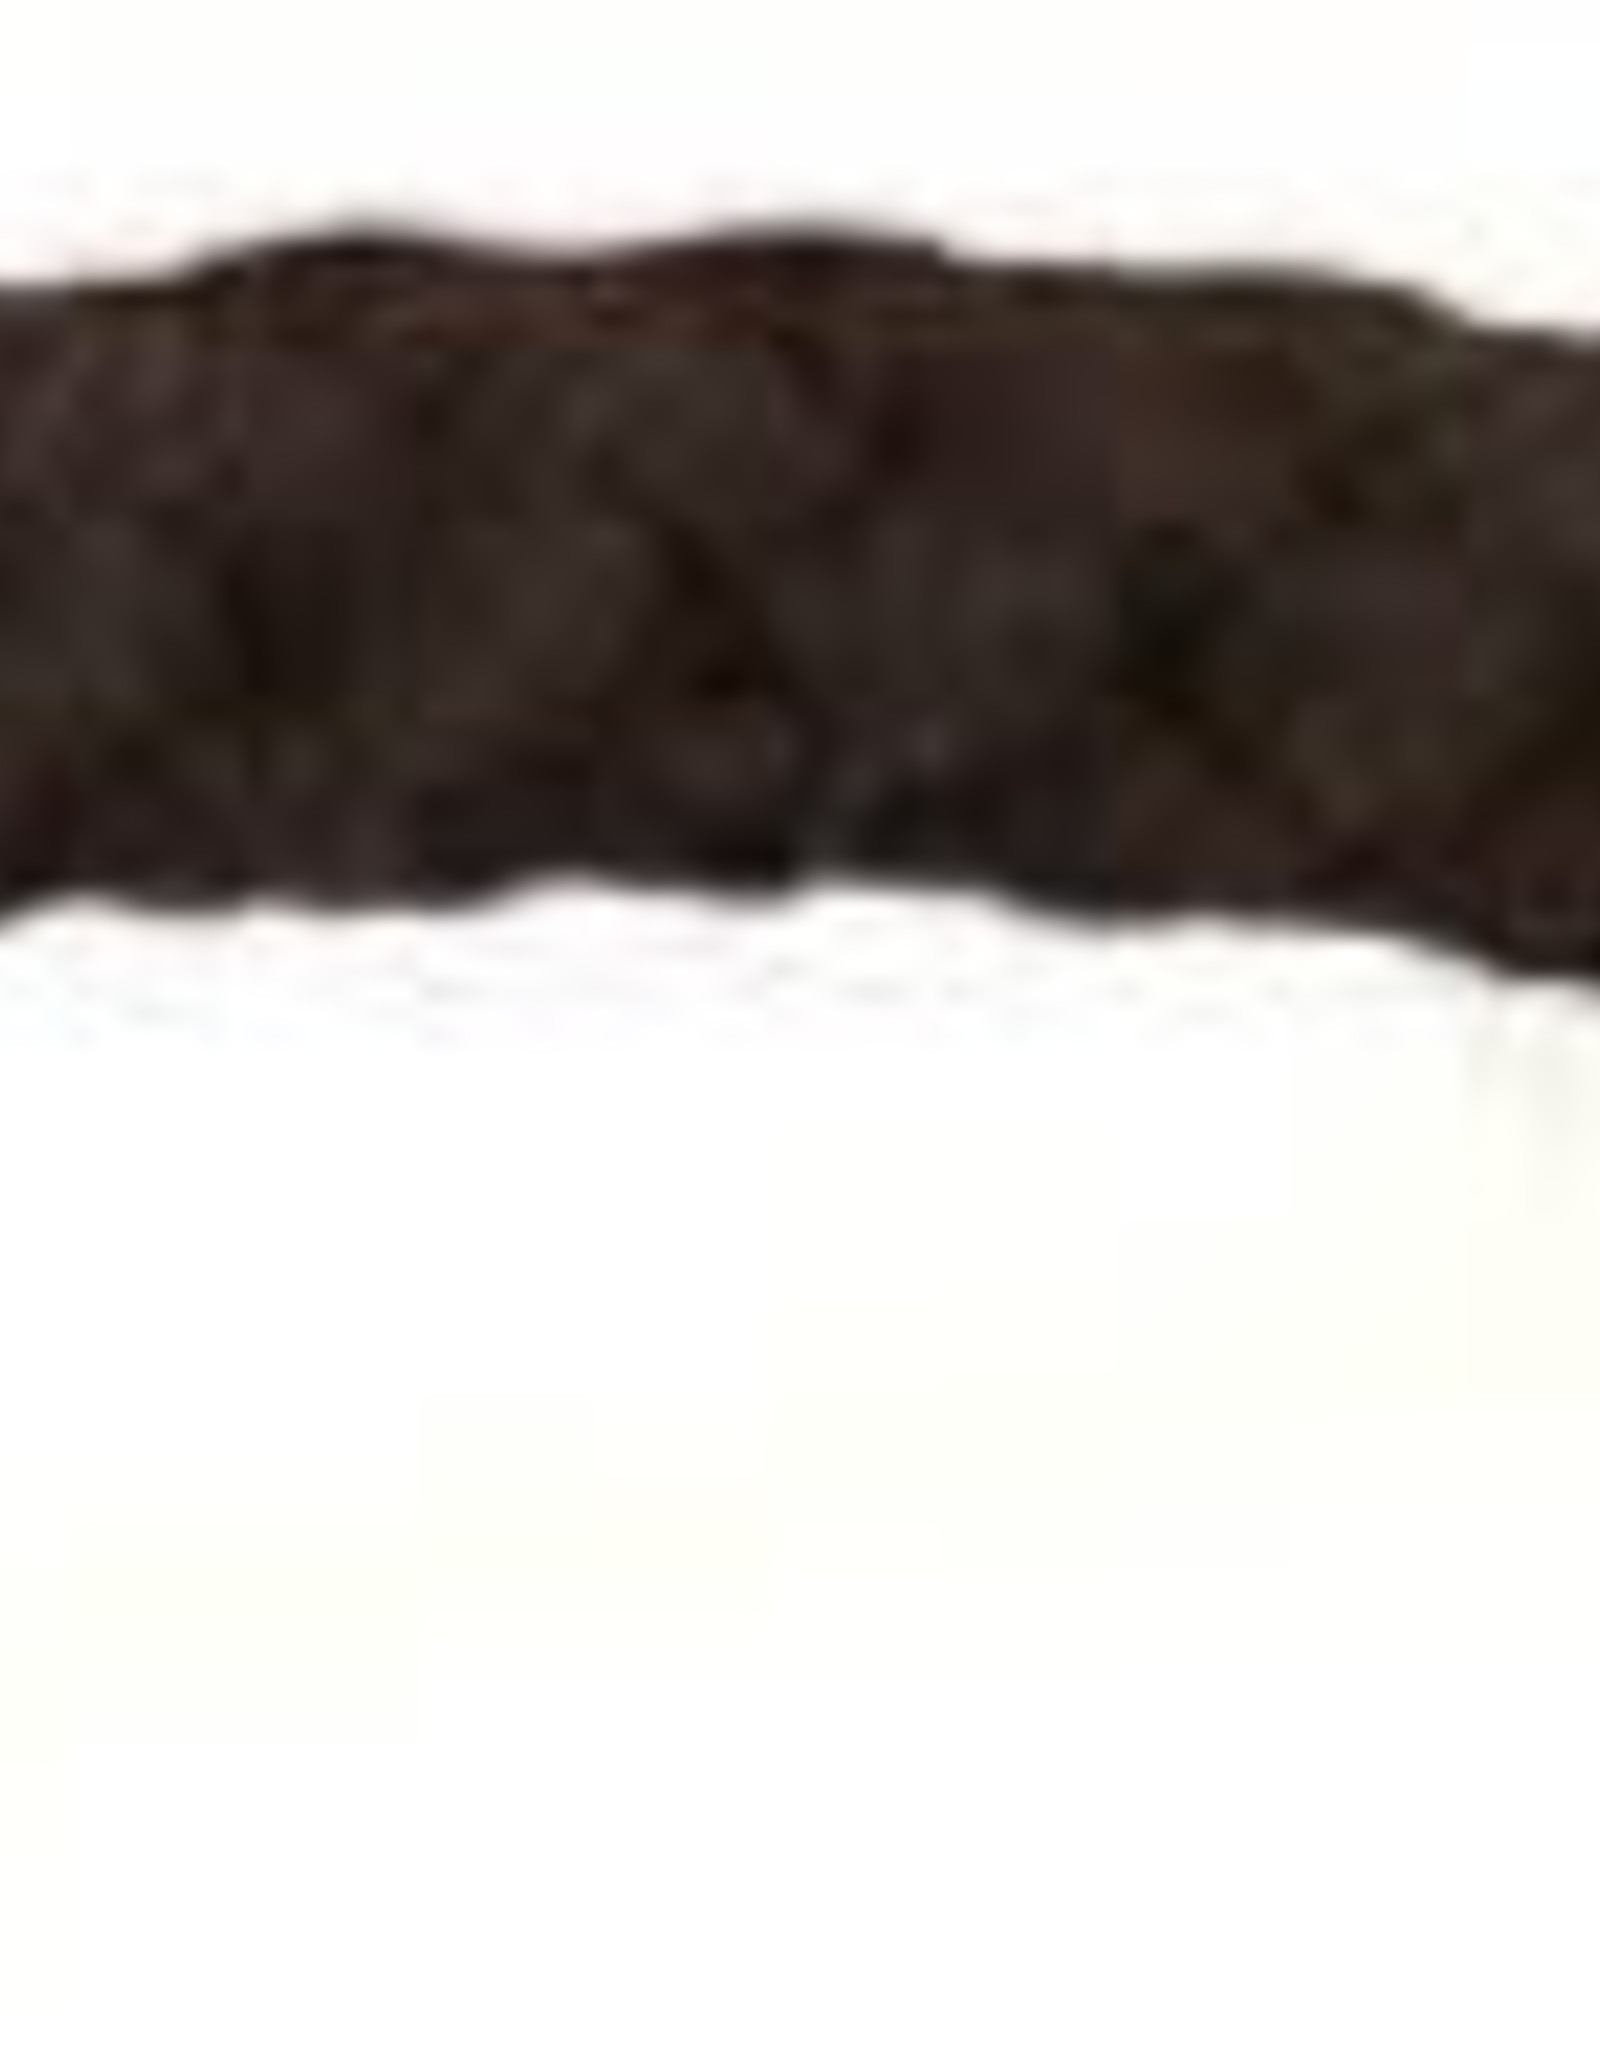 ANORAK KOORD 5mm bruin